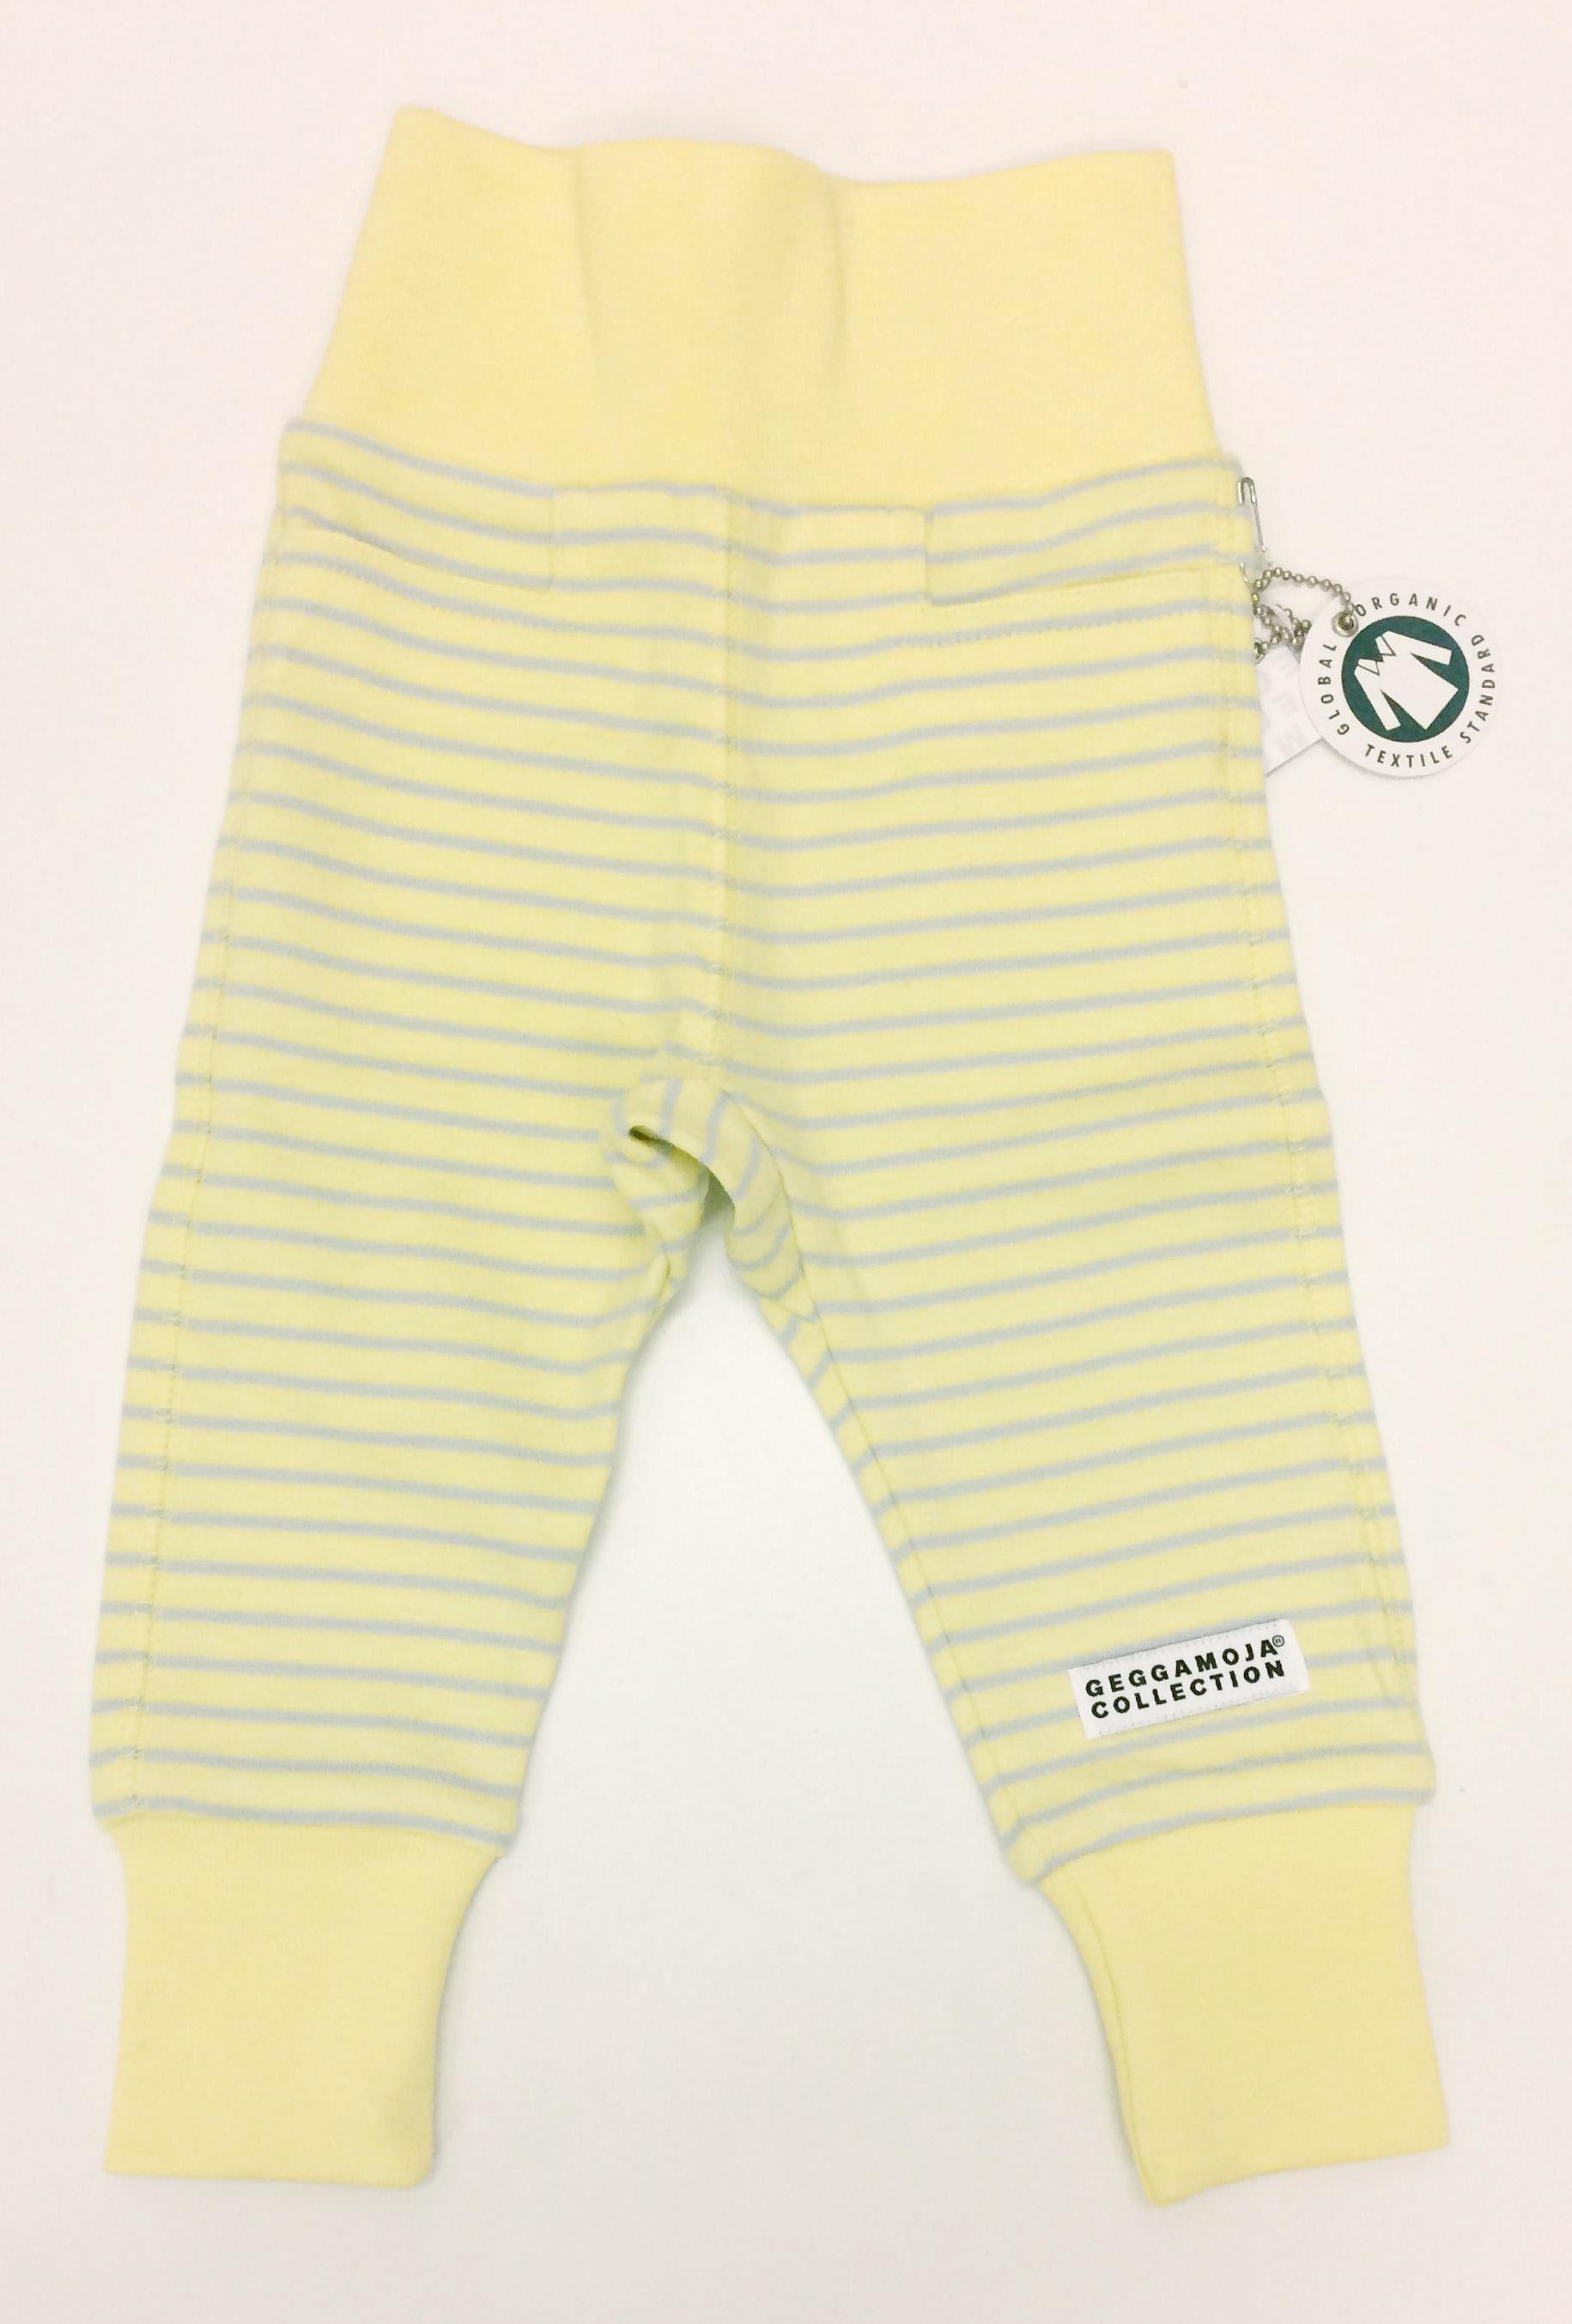 GM bebisbyxor ljusgul-grå